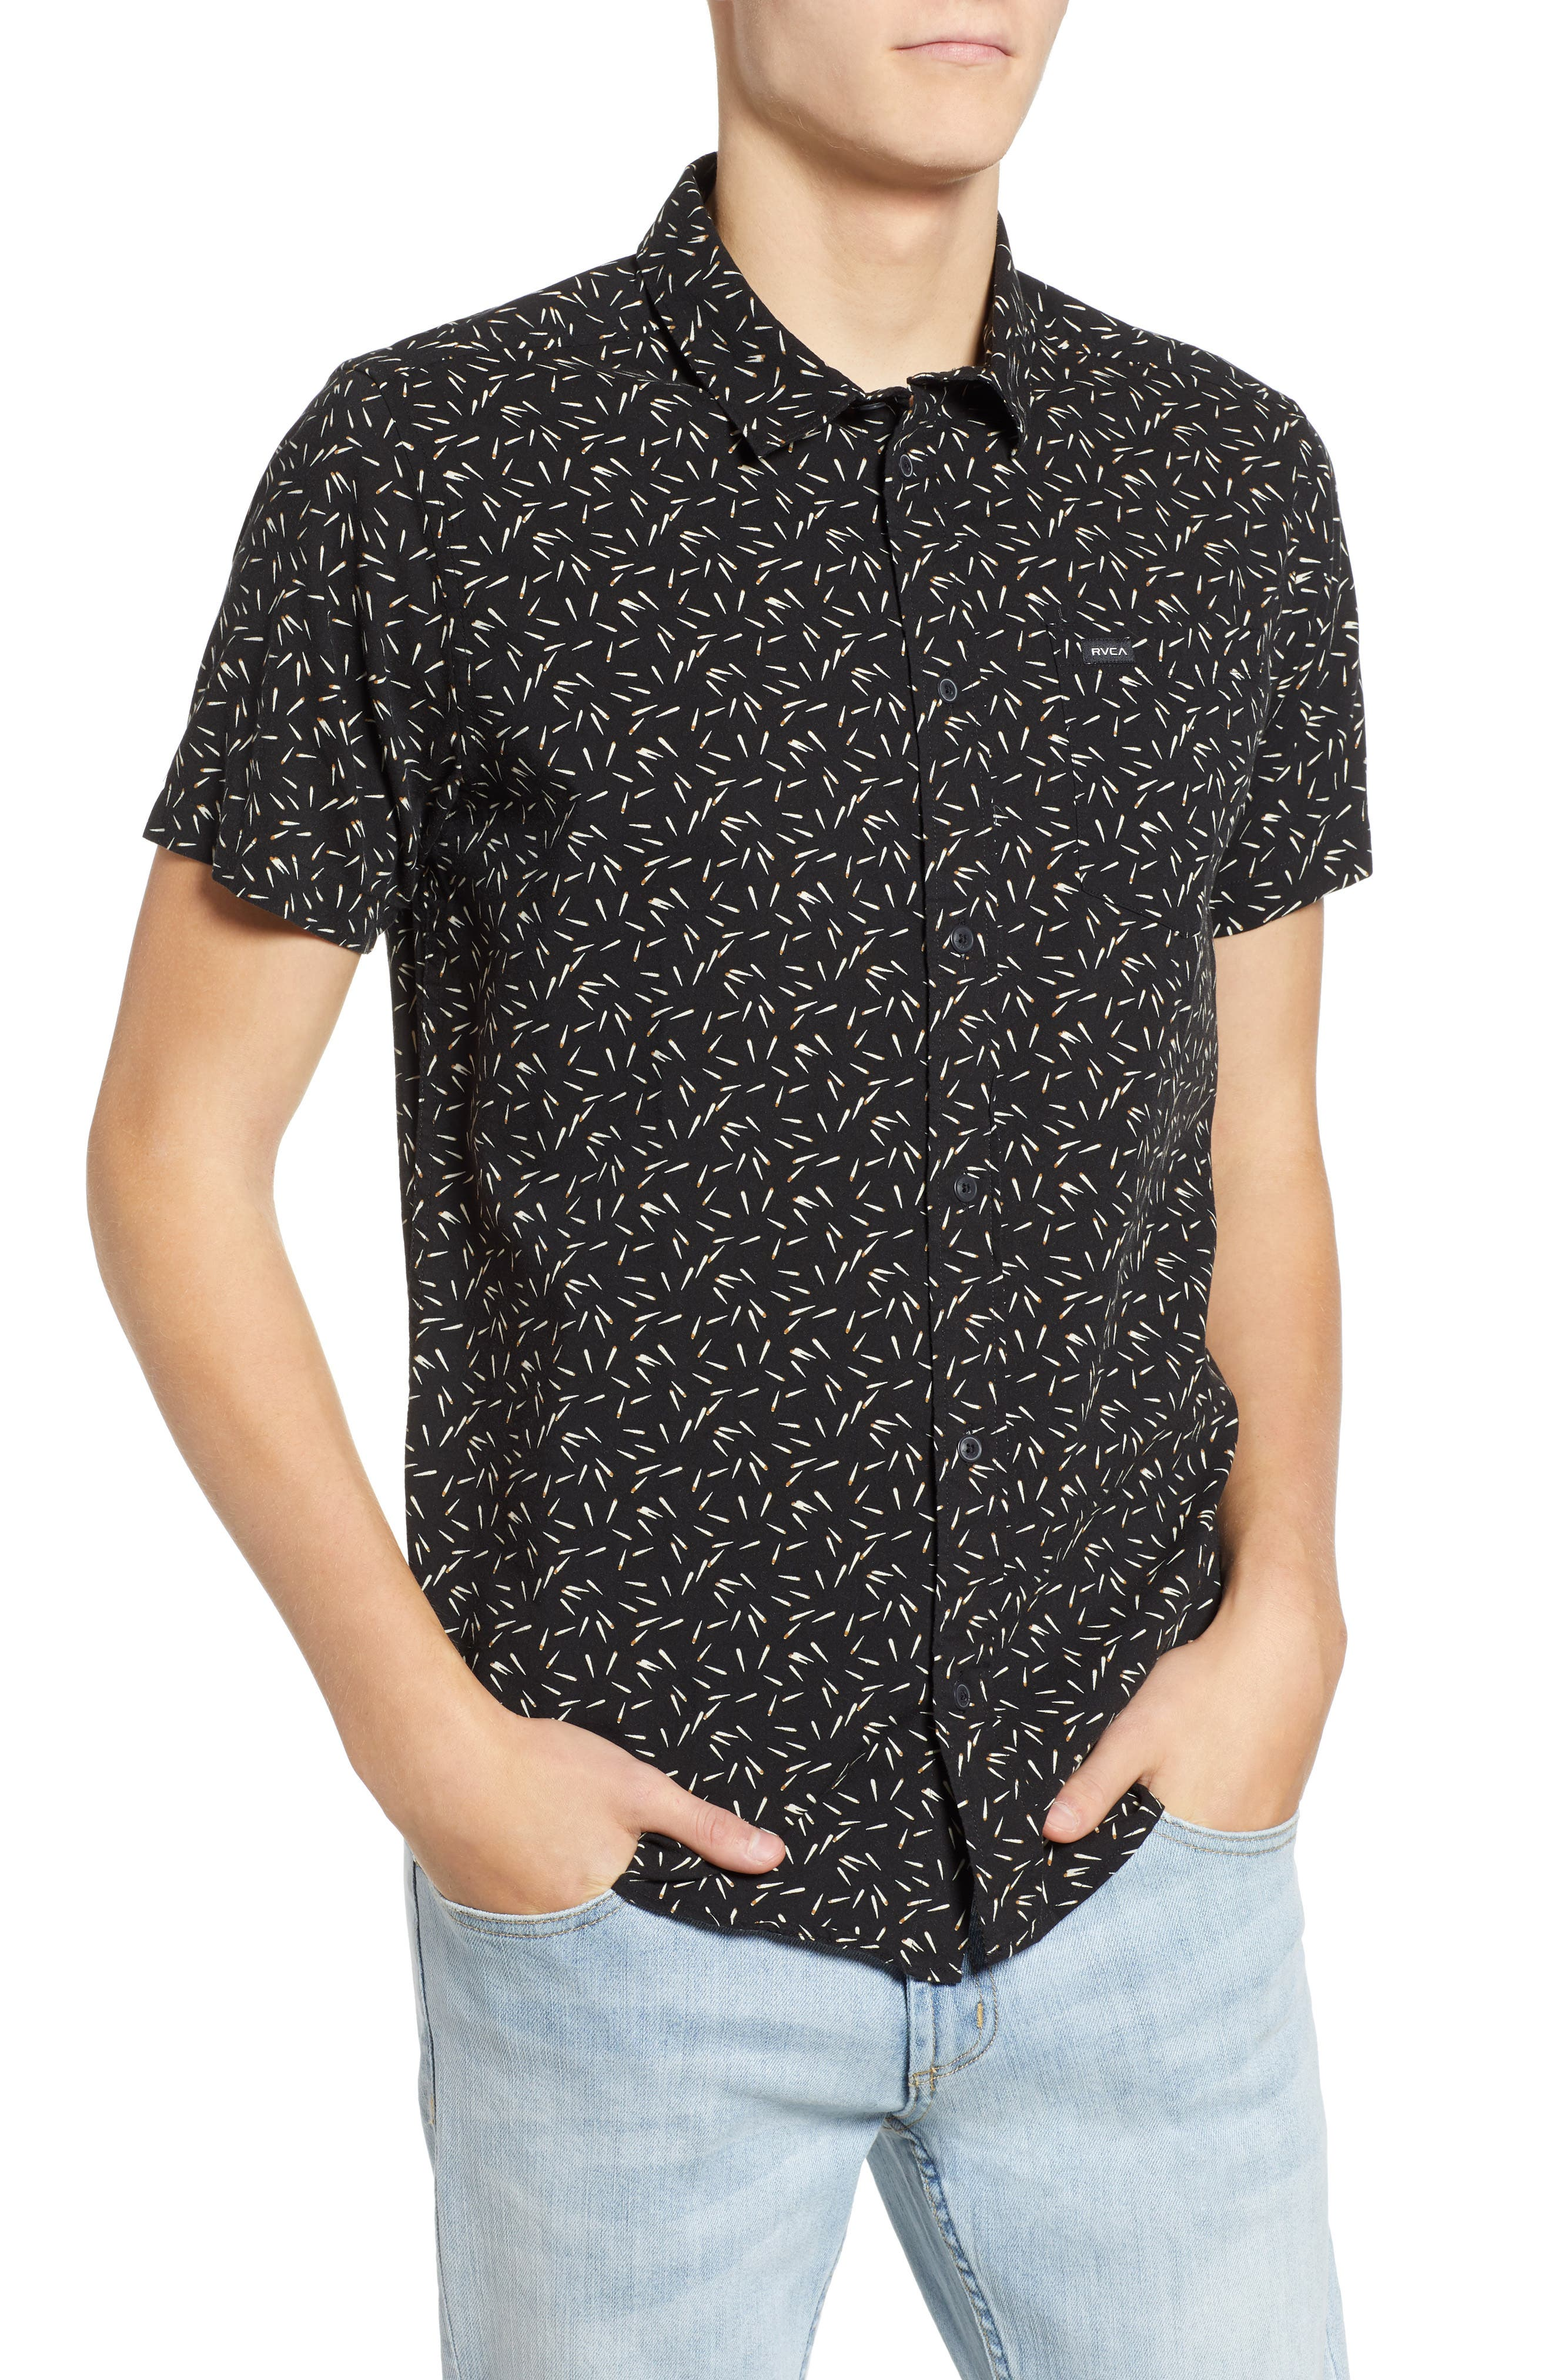 Pins & Needles Slim Fit Woven Shirt, Main, color, 020